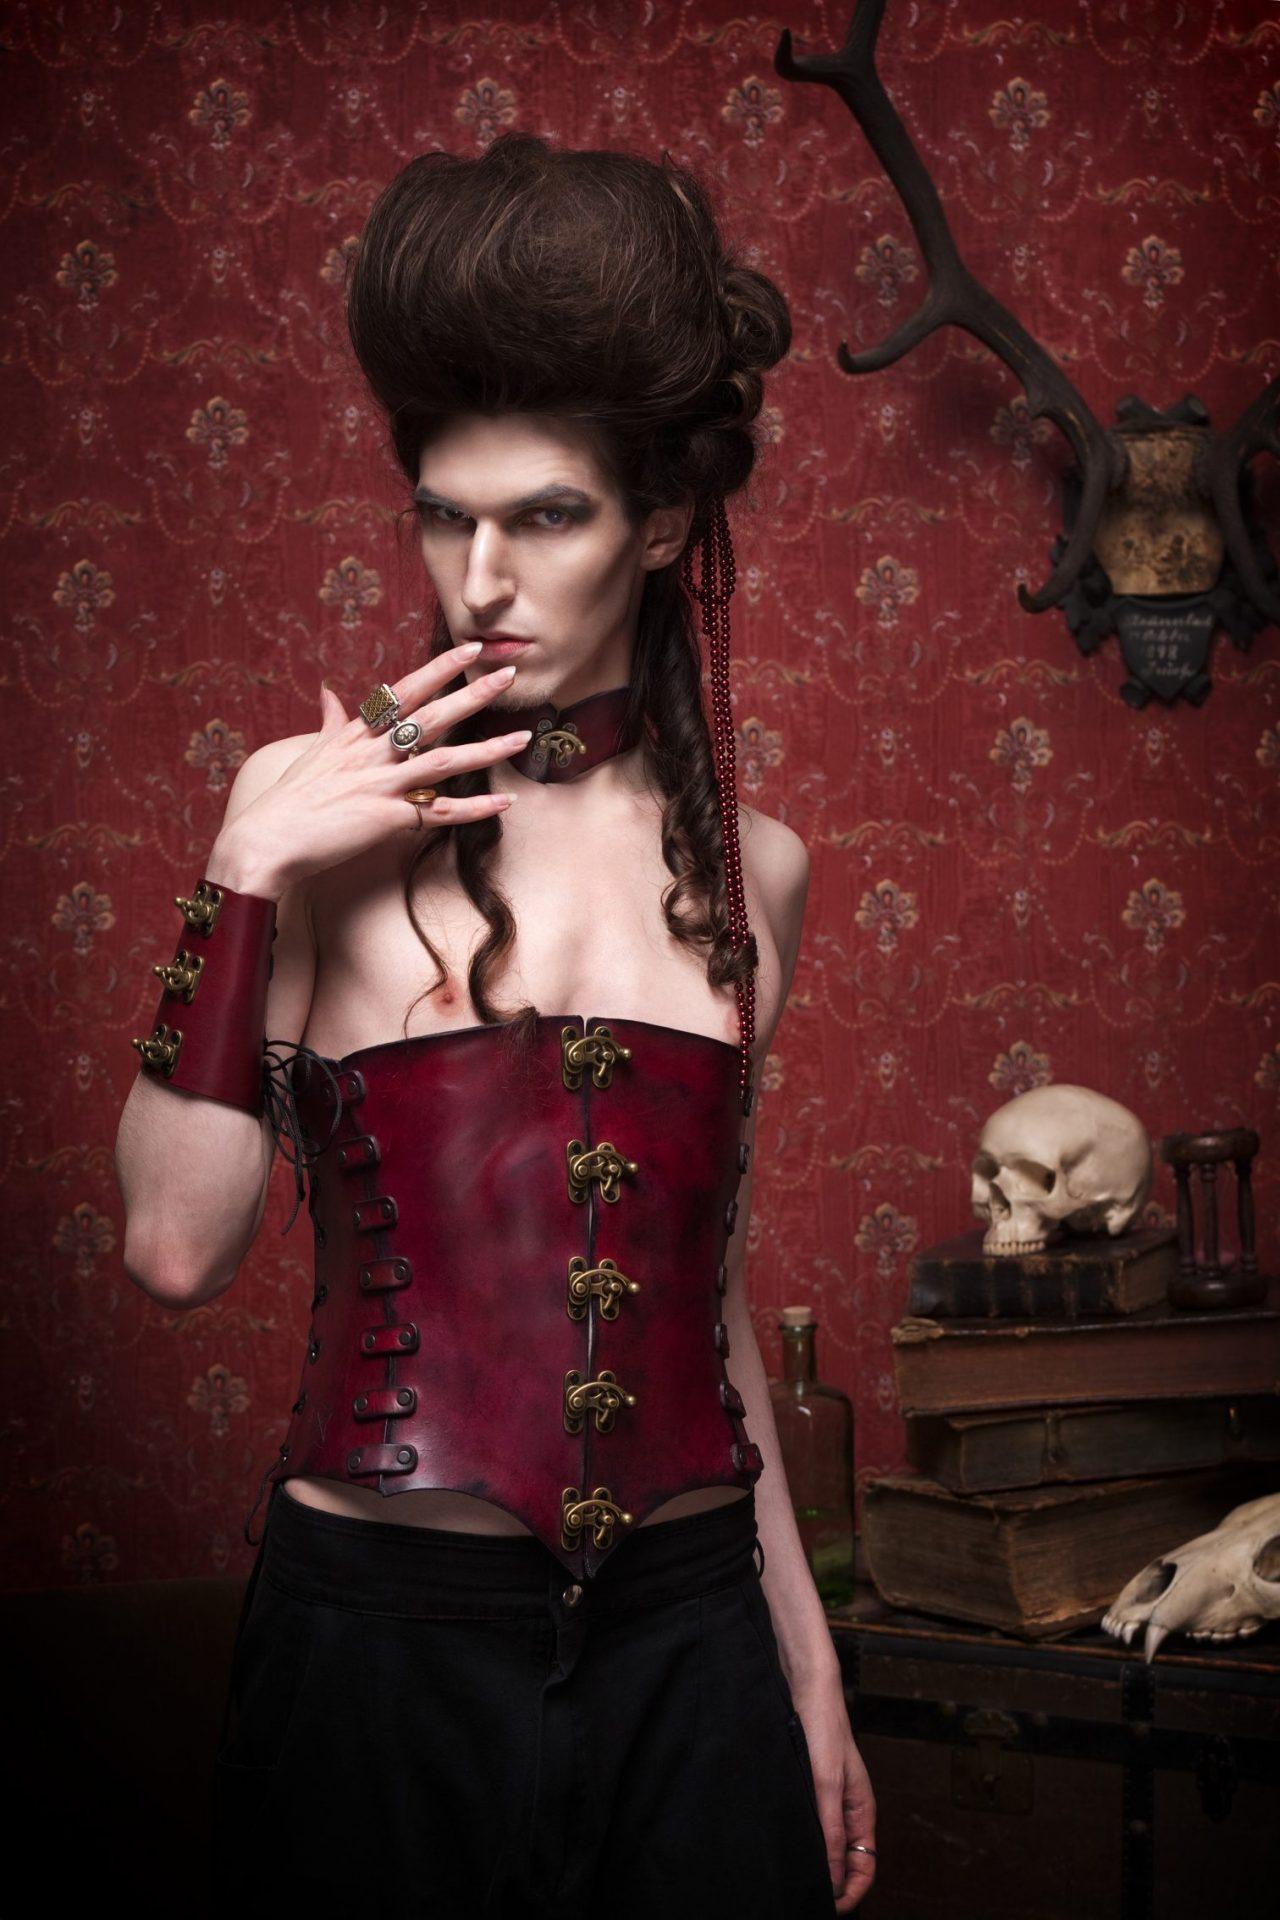 man corset, leather